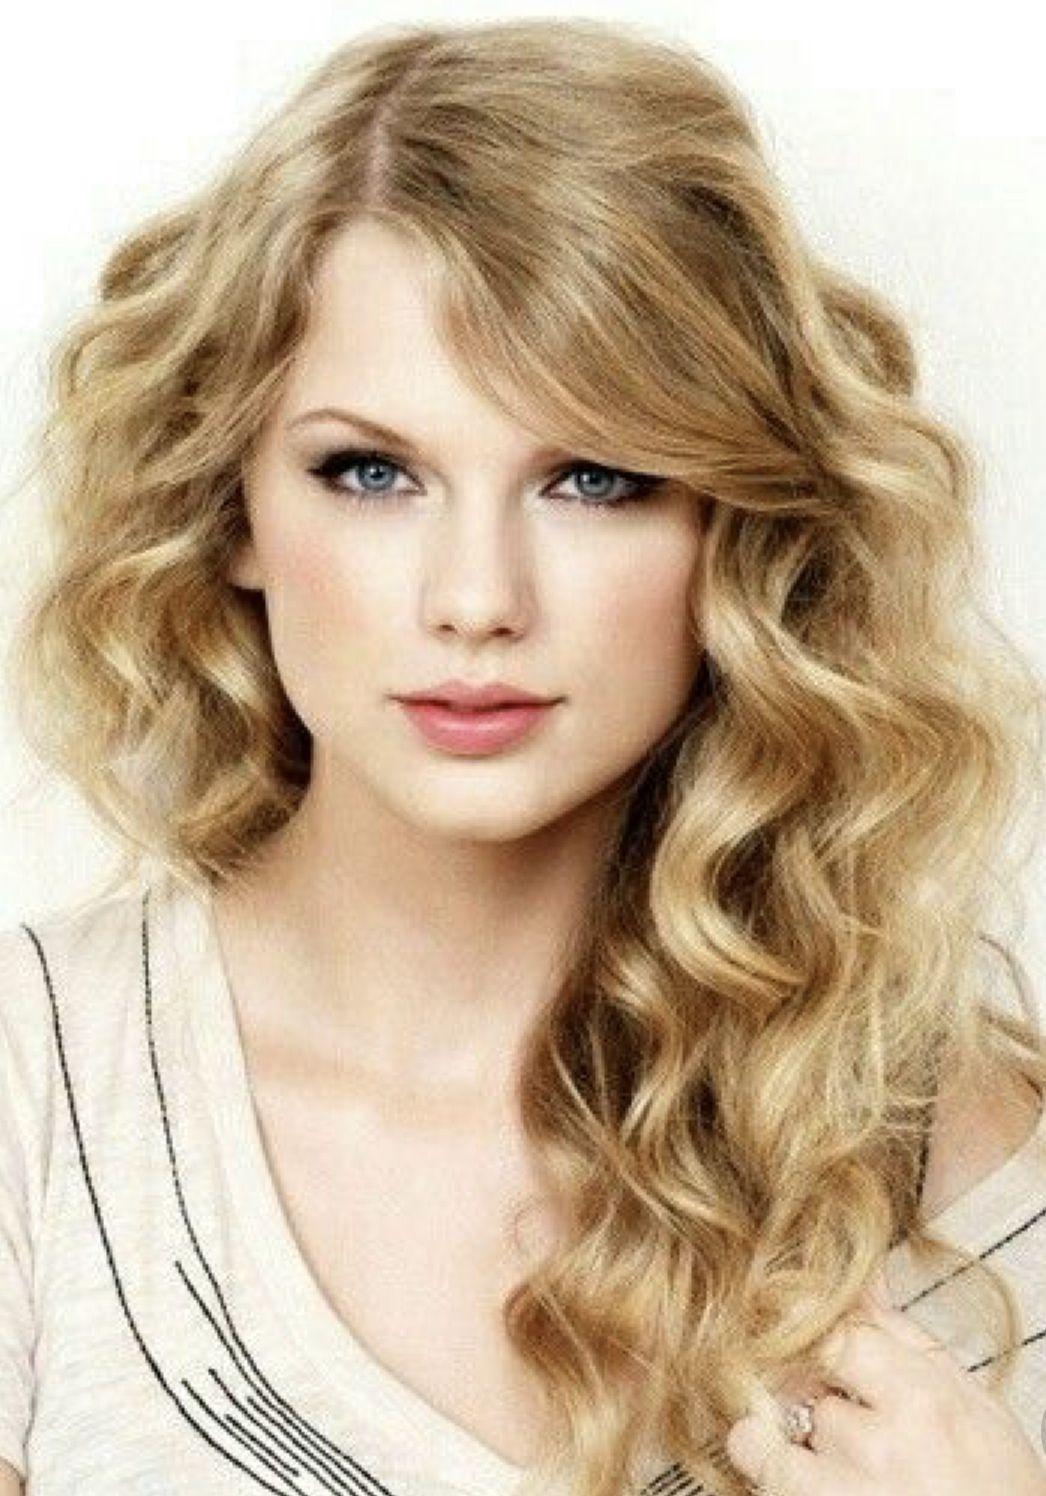 Angel Taylor Swift Taylor Swift Hair Taylor Swift Photoshoot Celebrity Hairstyles